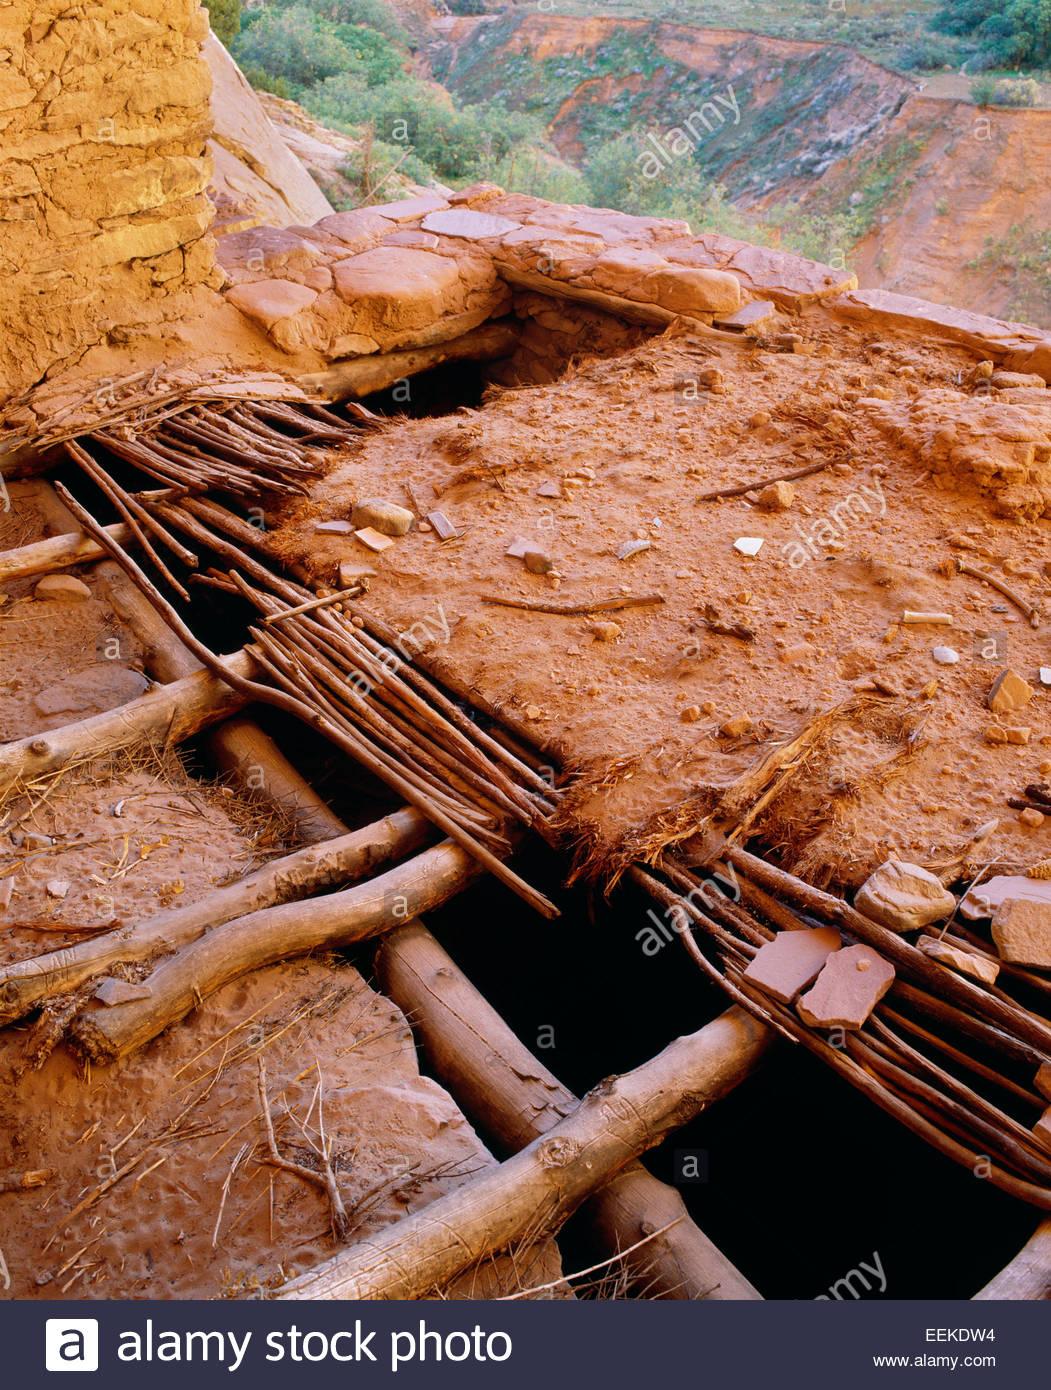 Original roof detail of mud and willows,  Ancient Anasazi dwelling.  Navajo National Monument, Arizona. - Stock Image